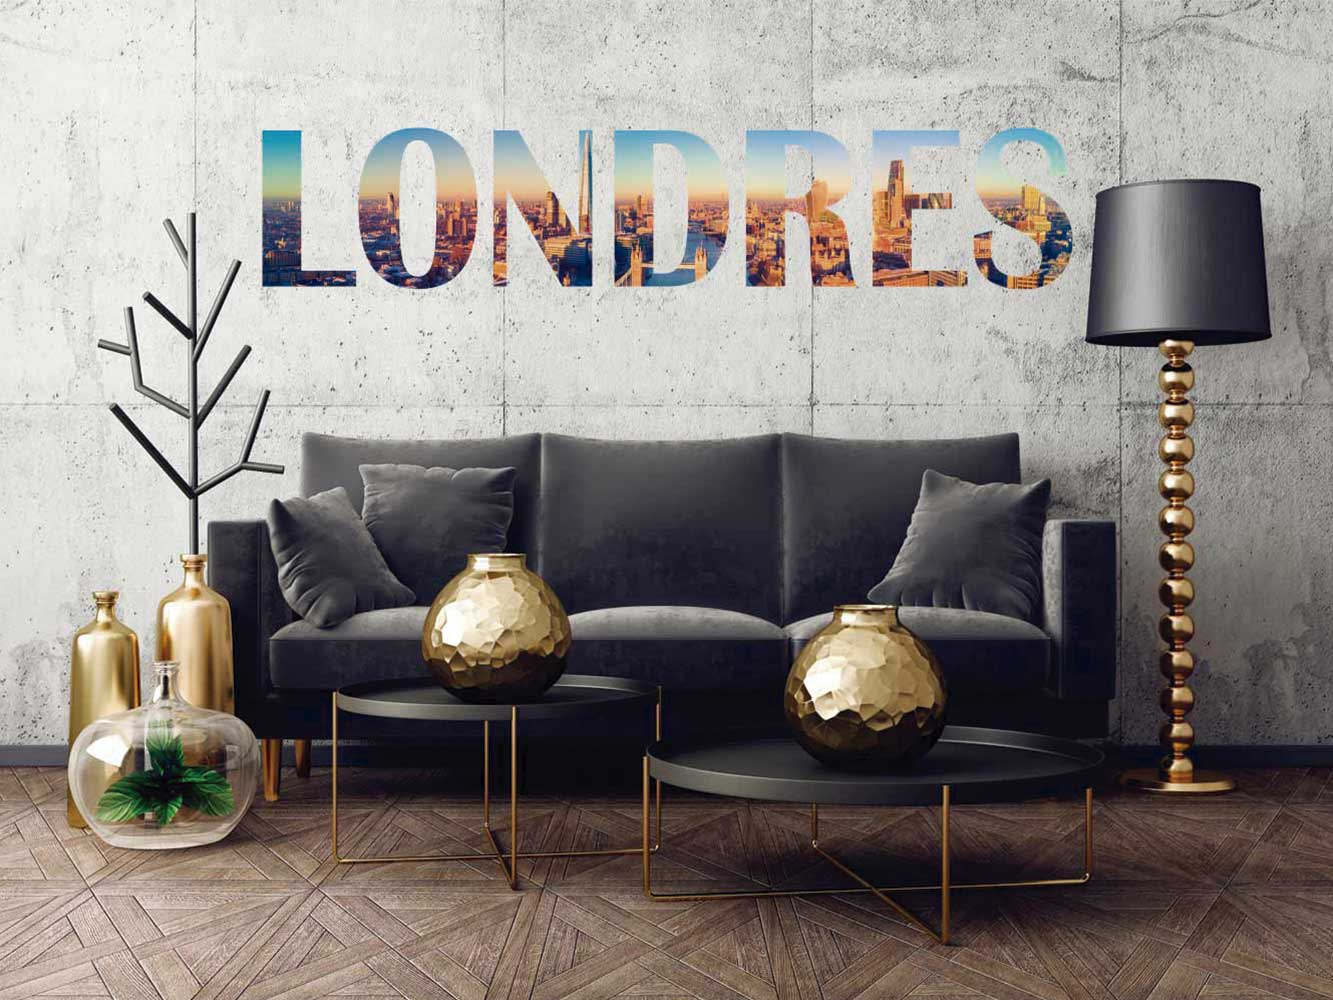 Vinilo Decorativo Ciudades Londres | Carteles XXL - Impresión carteleria publicitaria